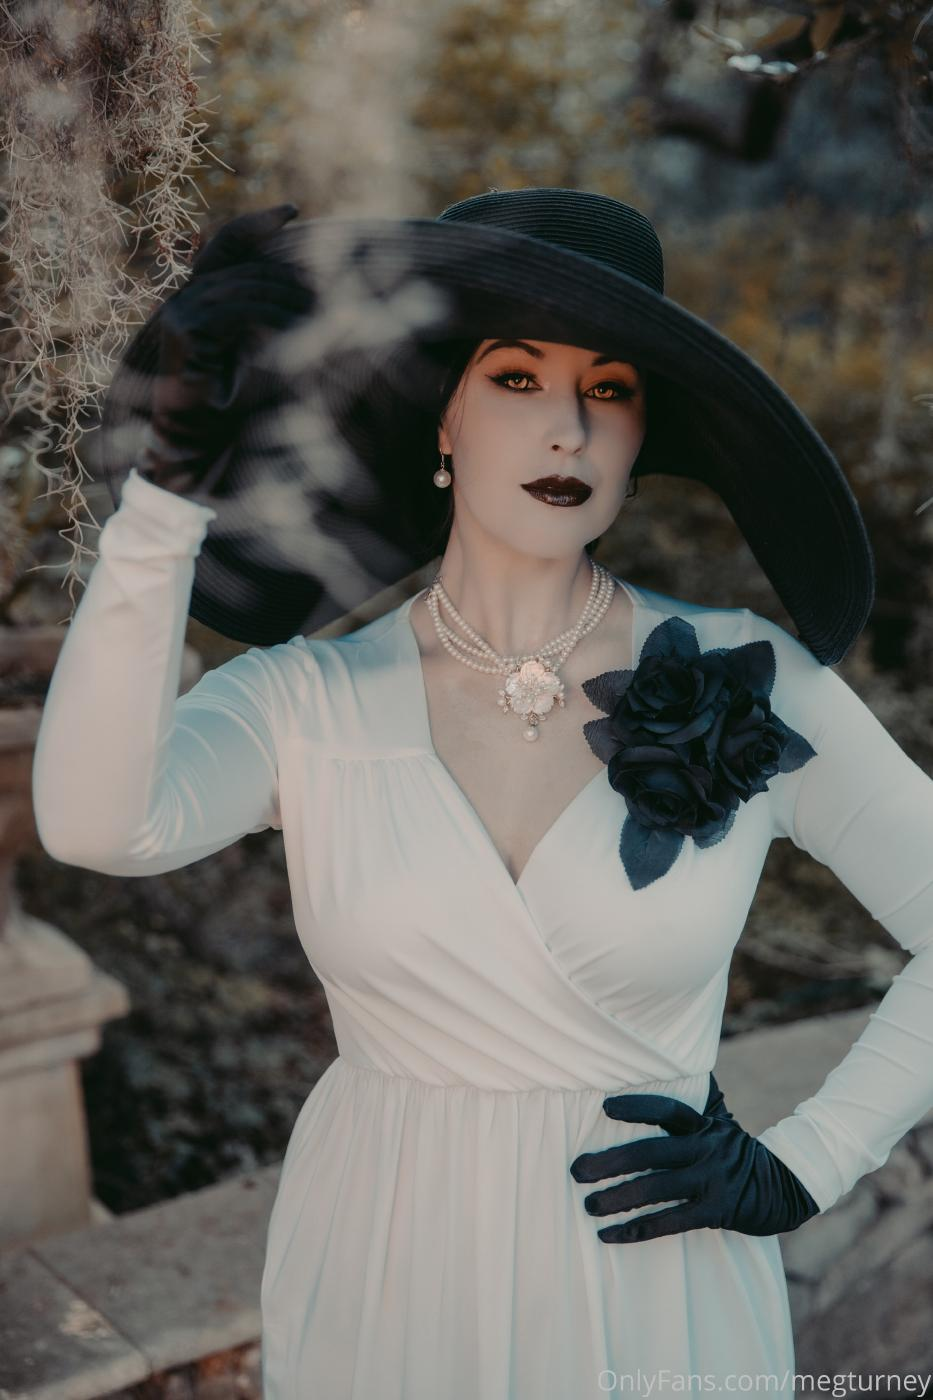 Meg Turney Lady Dimitrescu Cosplay Onlyfans Set Leaked 0018